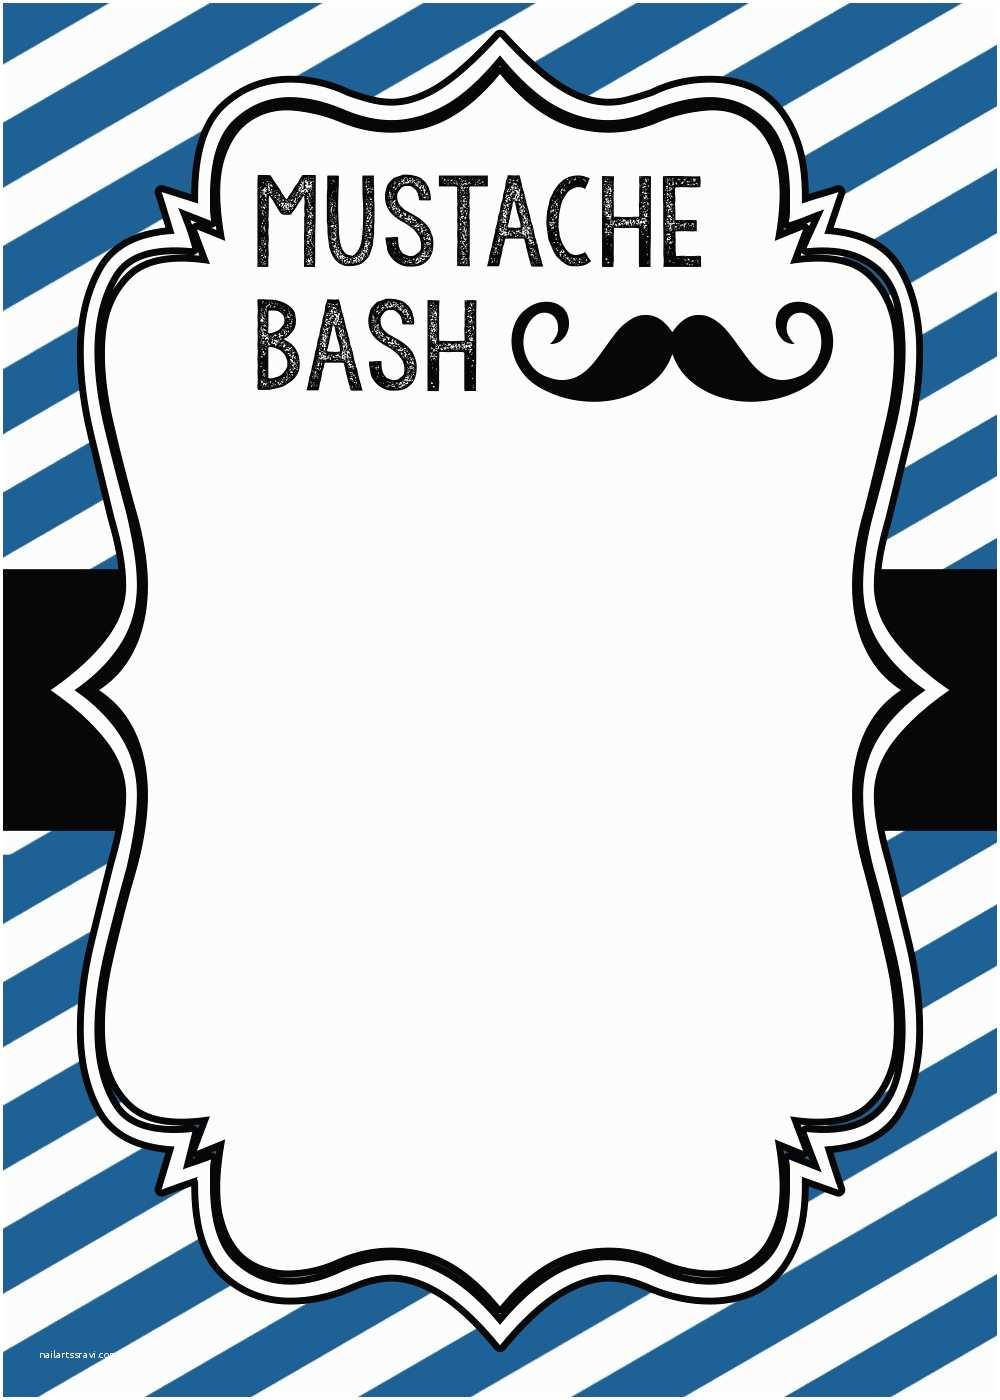 Mustache Birthday Invitations Mustache Party Baby Shower or Birthday Invite Paper